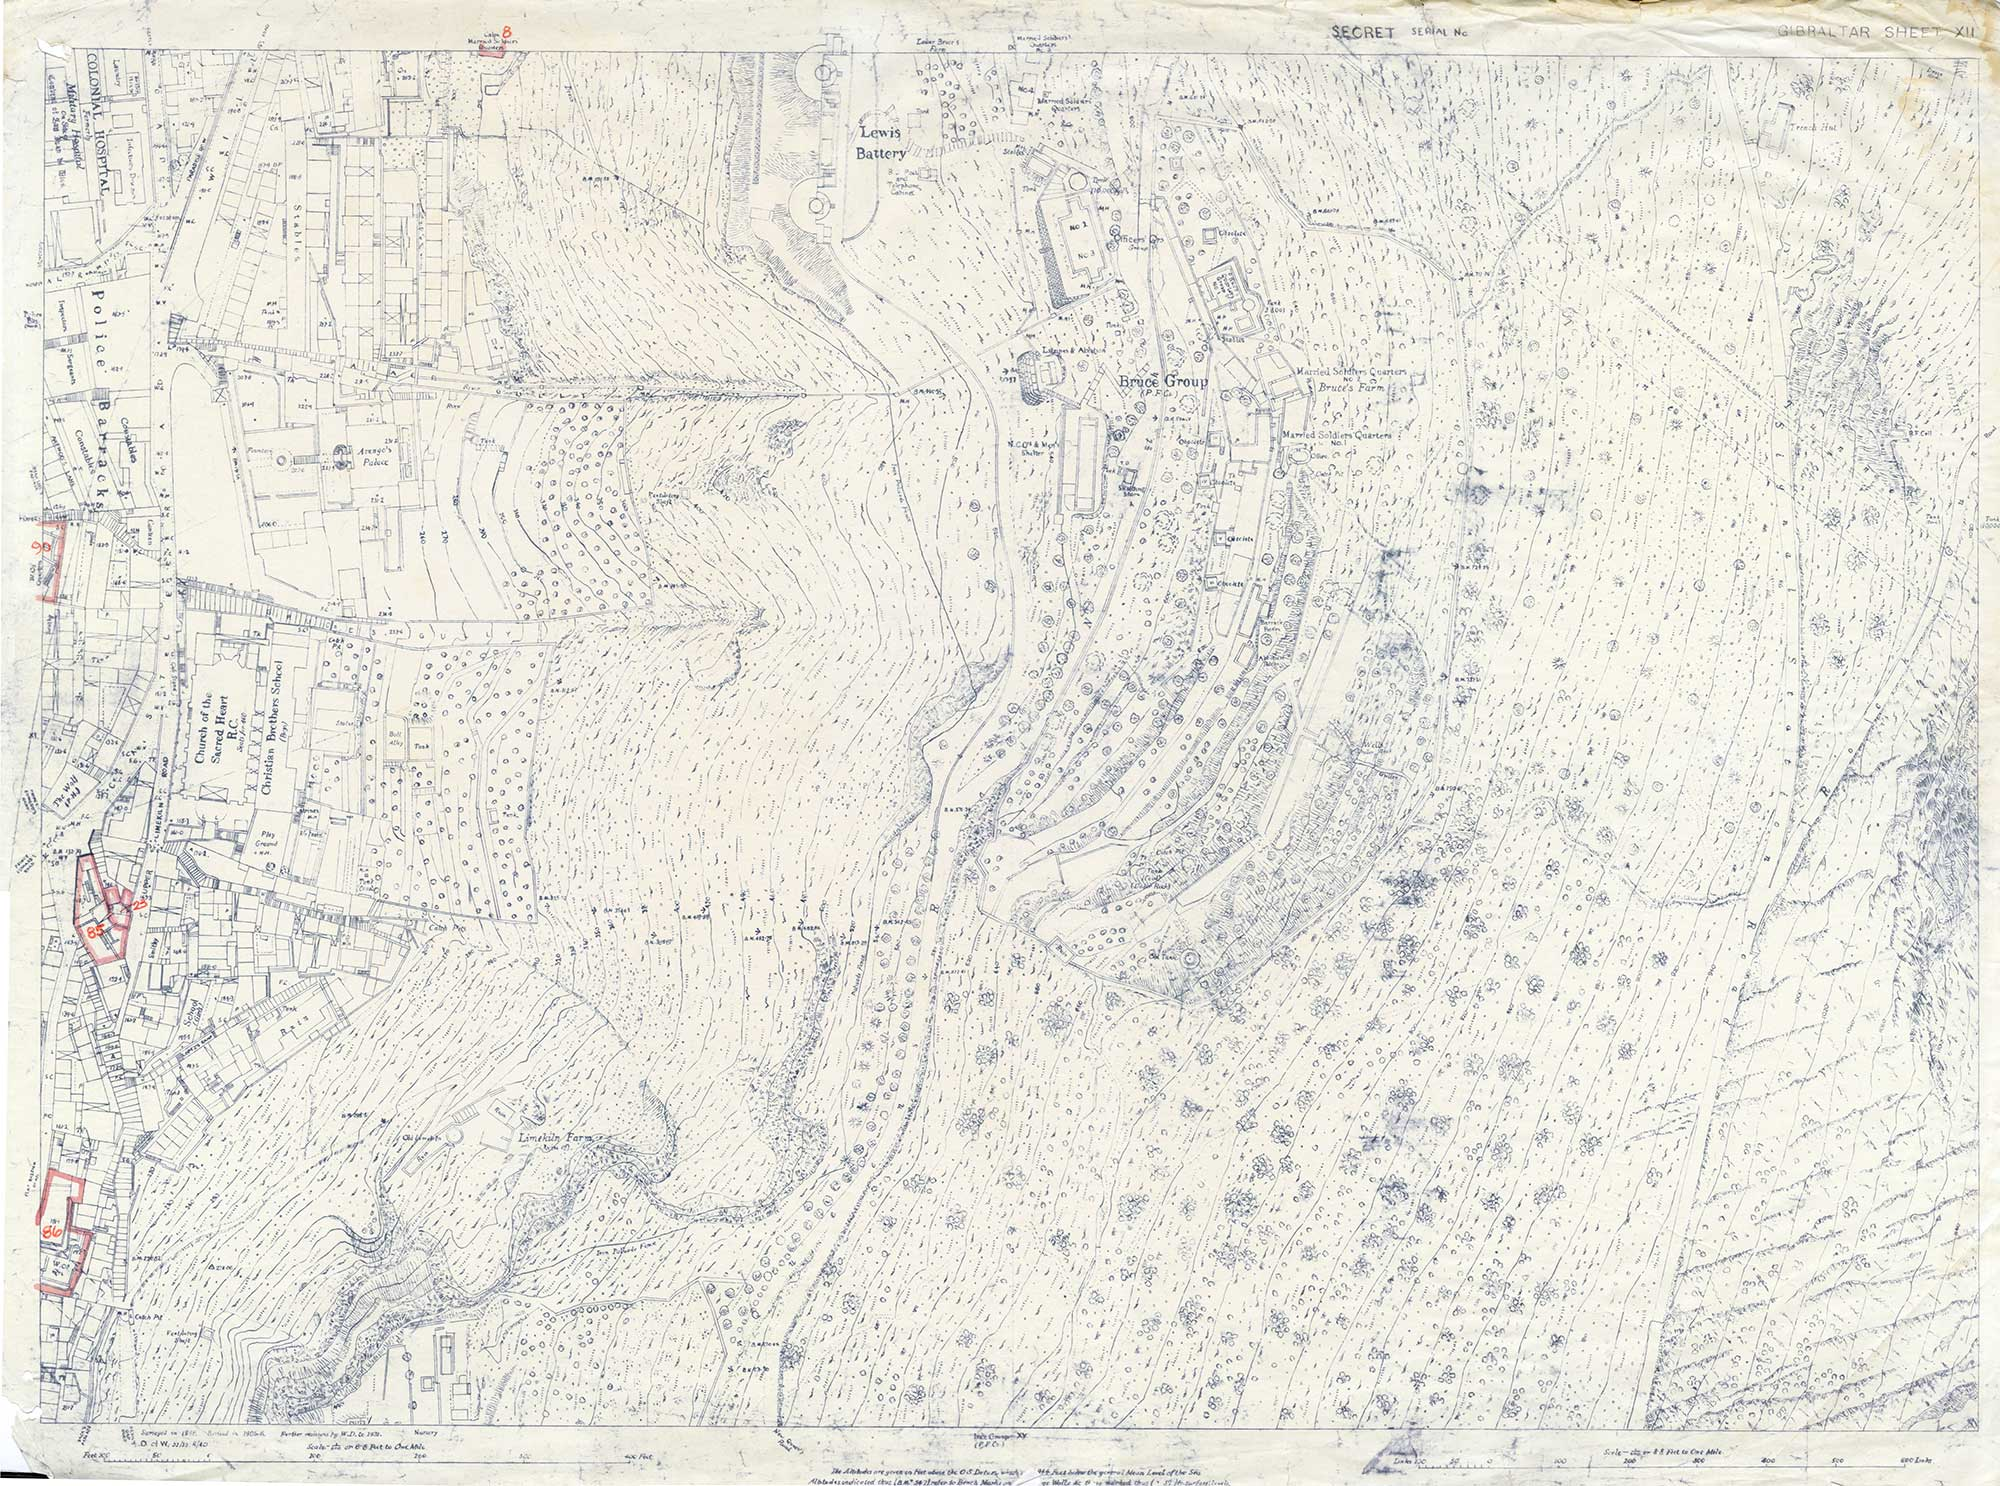 Map-48-OS-sheet-7-Bruces-Group---Police-Barracks-1931